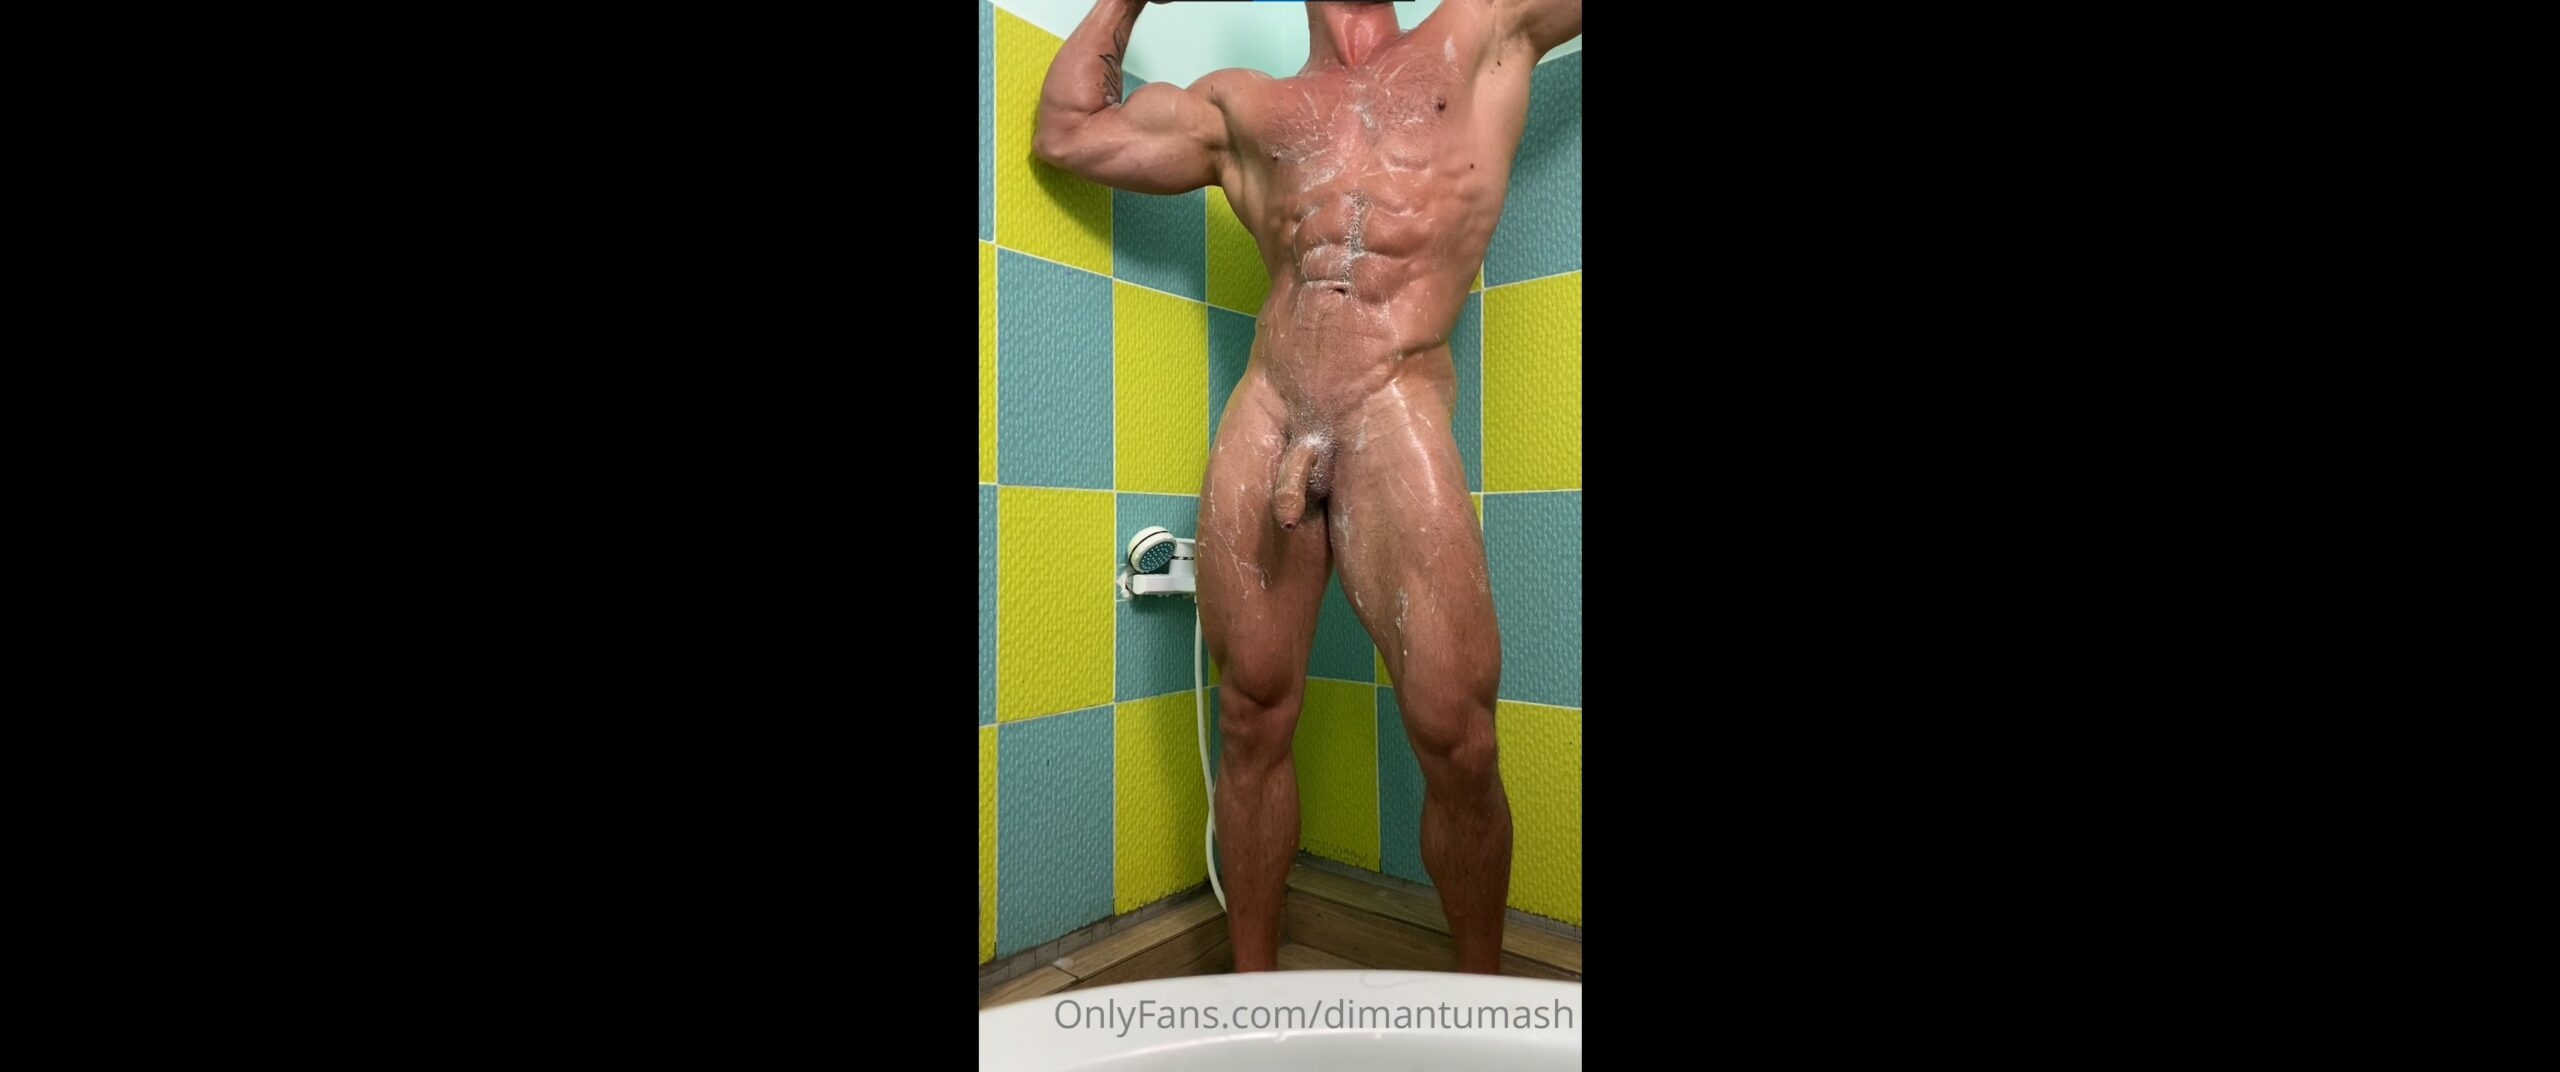 Having a shower and jerking my cock - Dmitry Tumash (dimantumash)